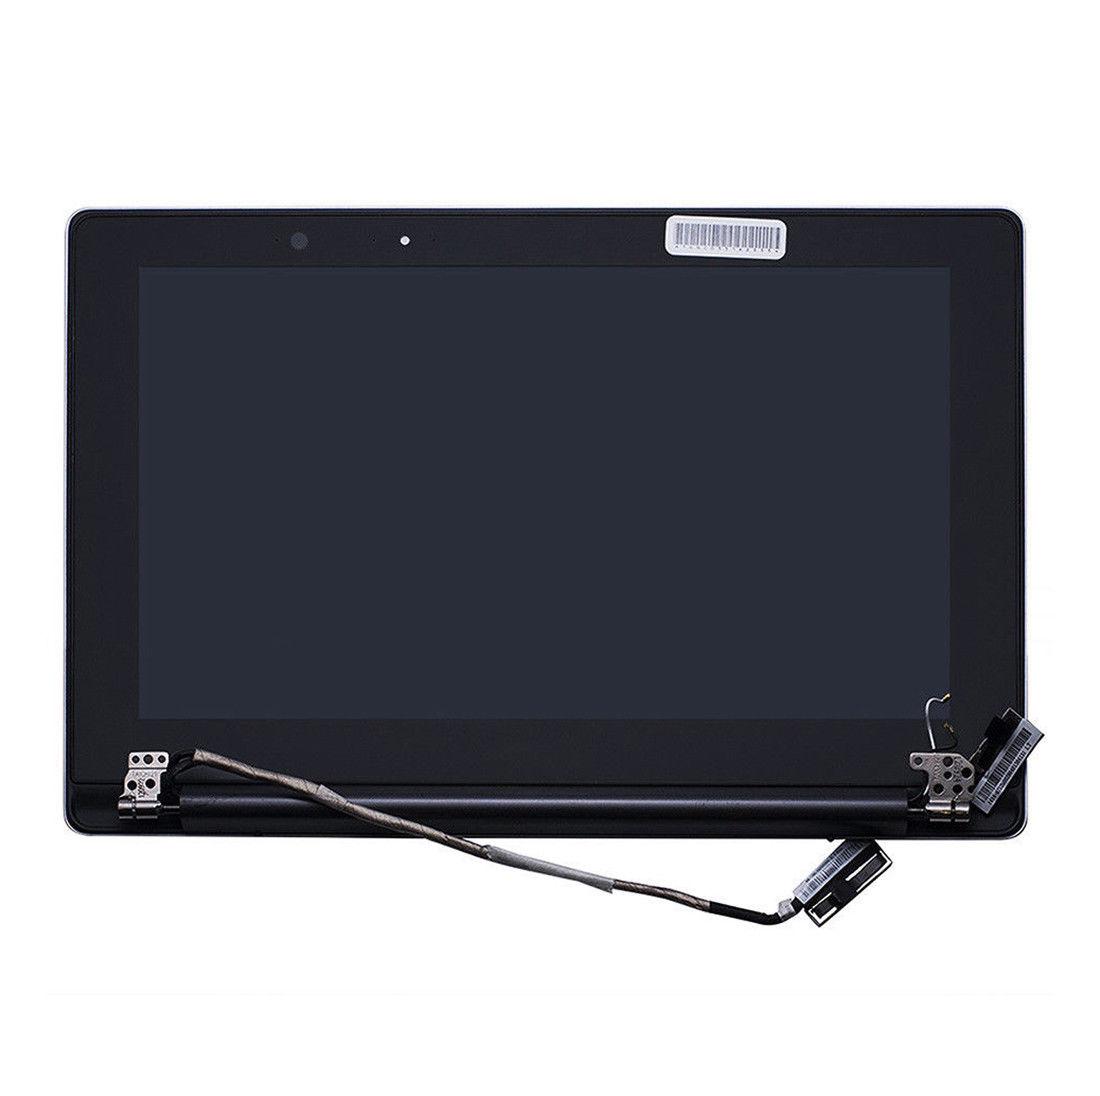 https://www.mondonotebook.it/7464/iphone-4-buzzer-ringer-complete-unit-with-antenna.jpg